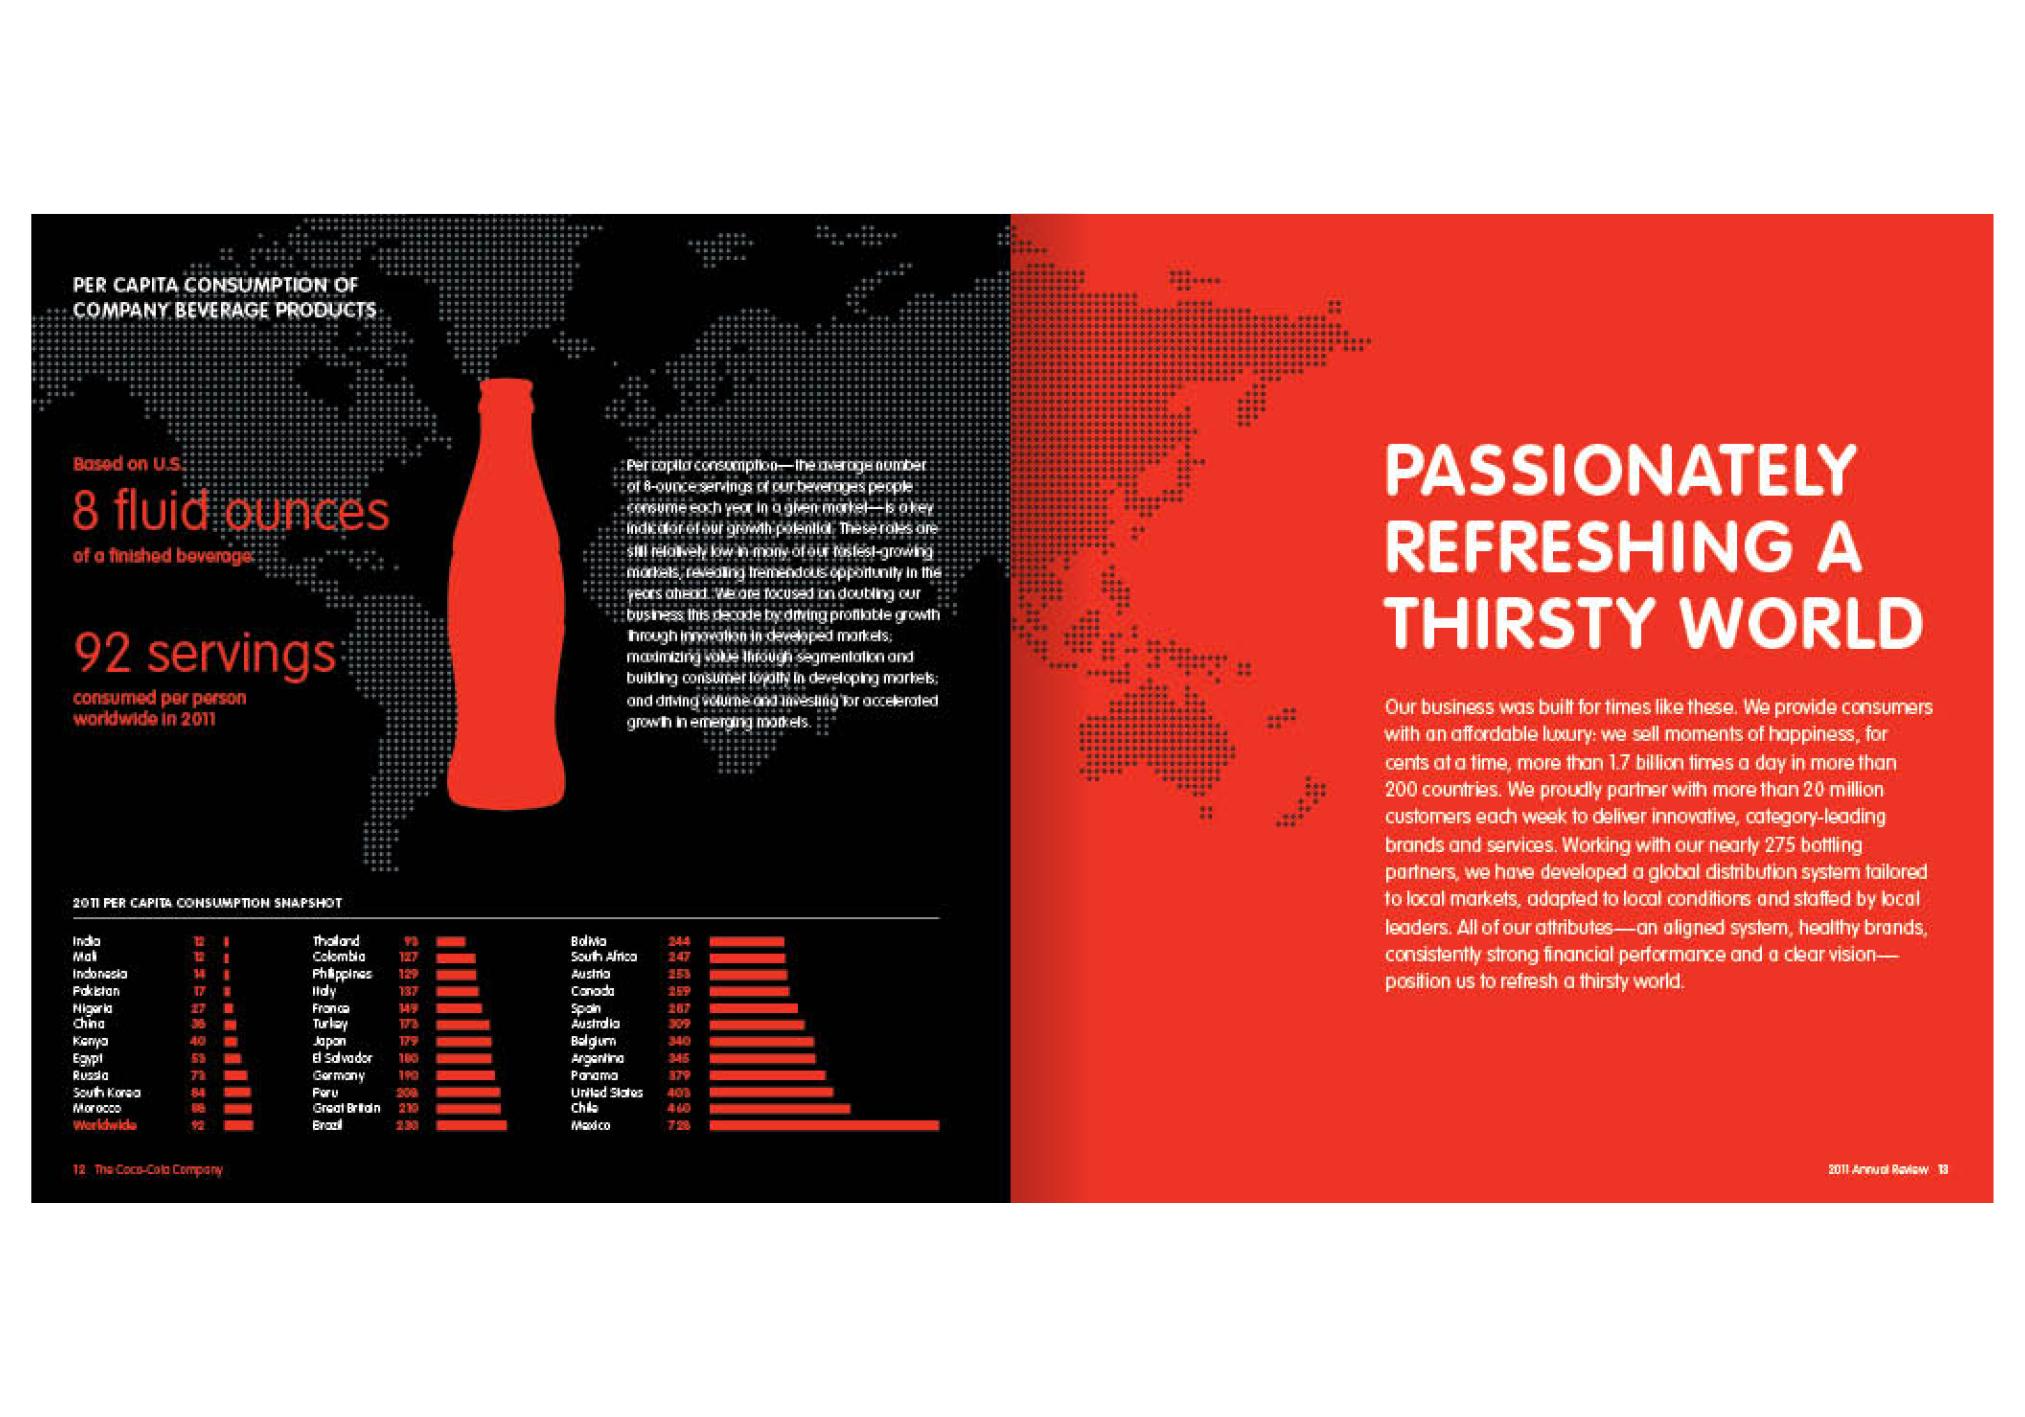 coca cola balance sheet 2011